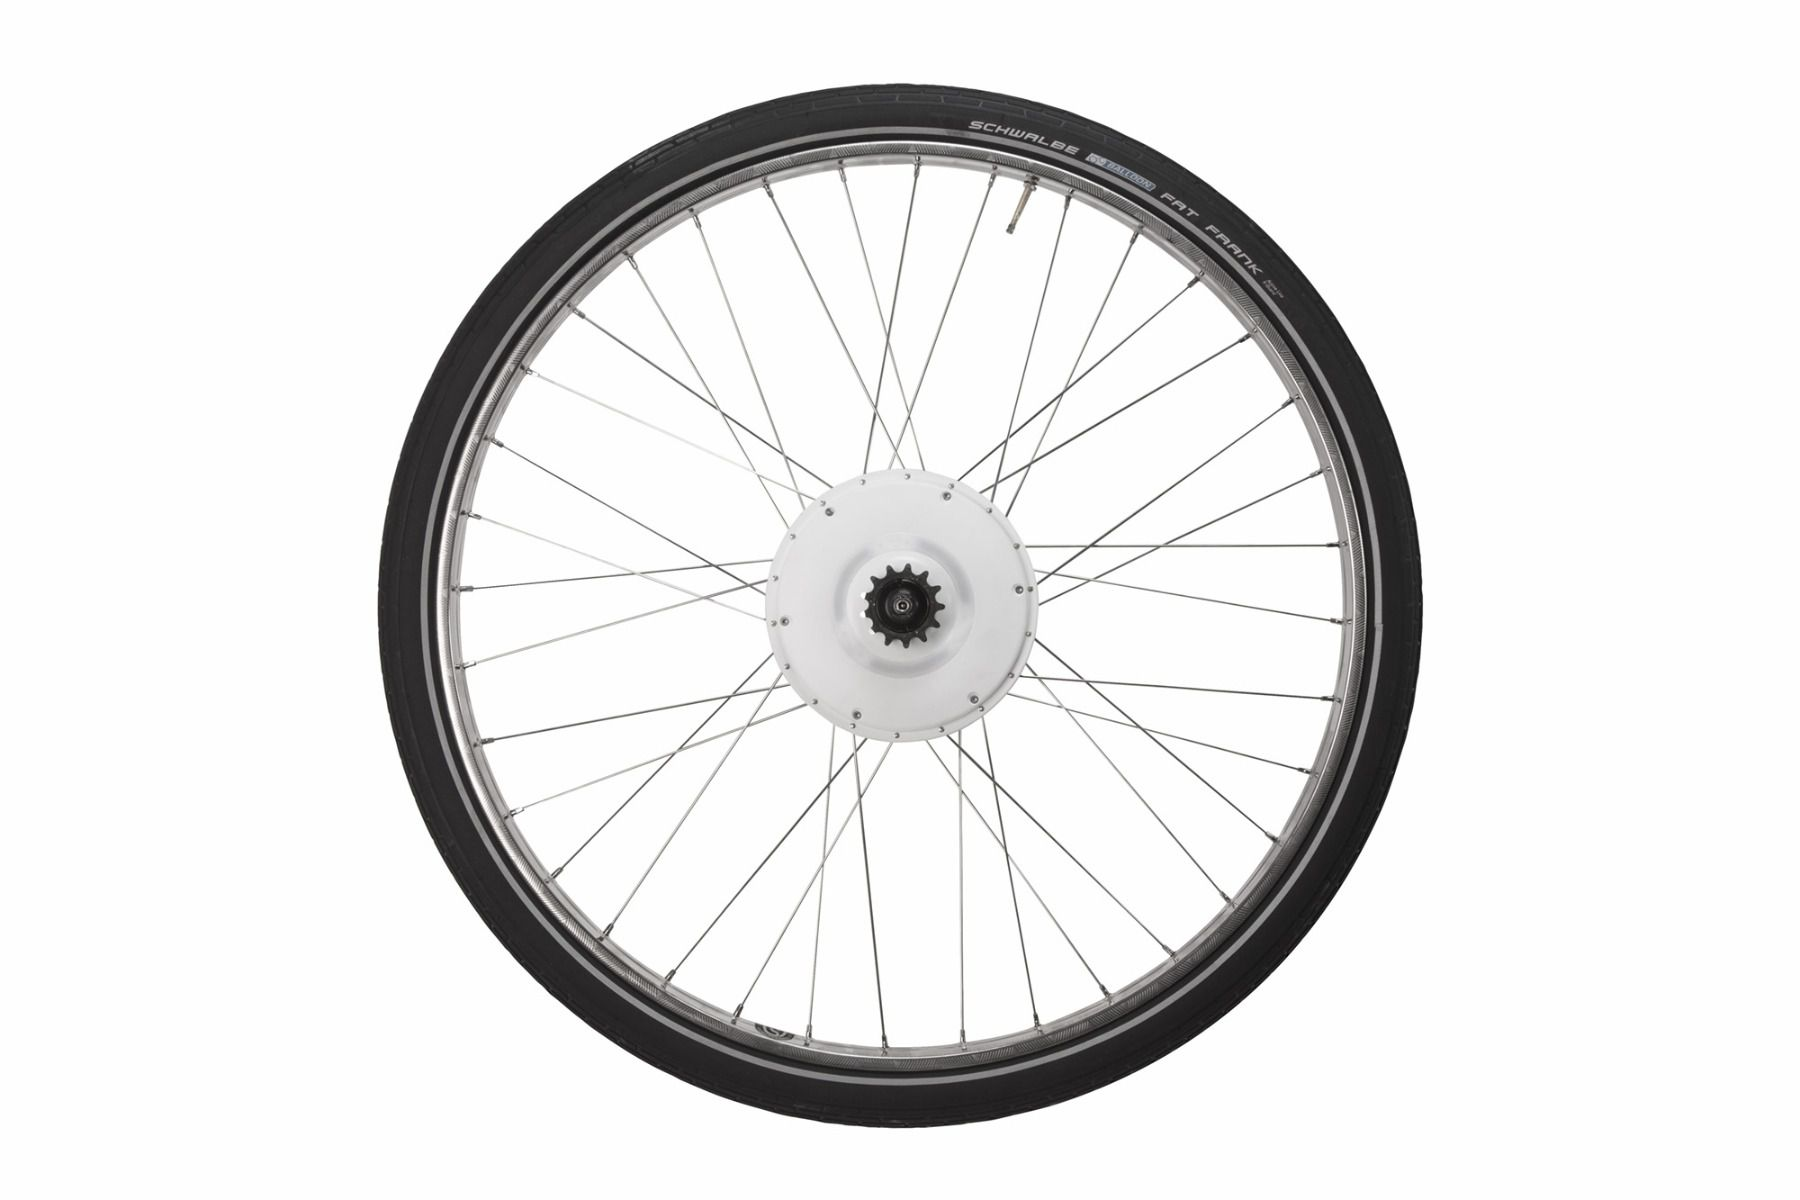 ebike smart wheel all in one.jpg